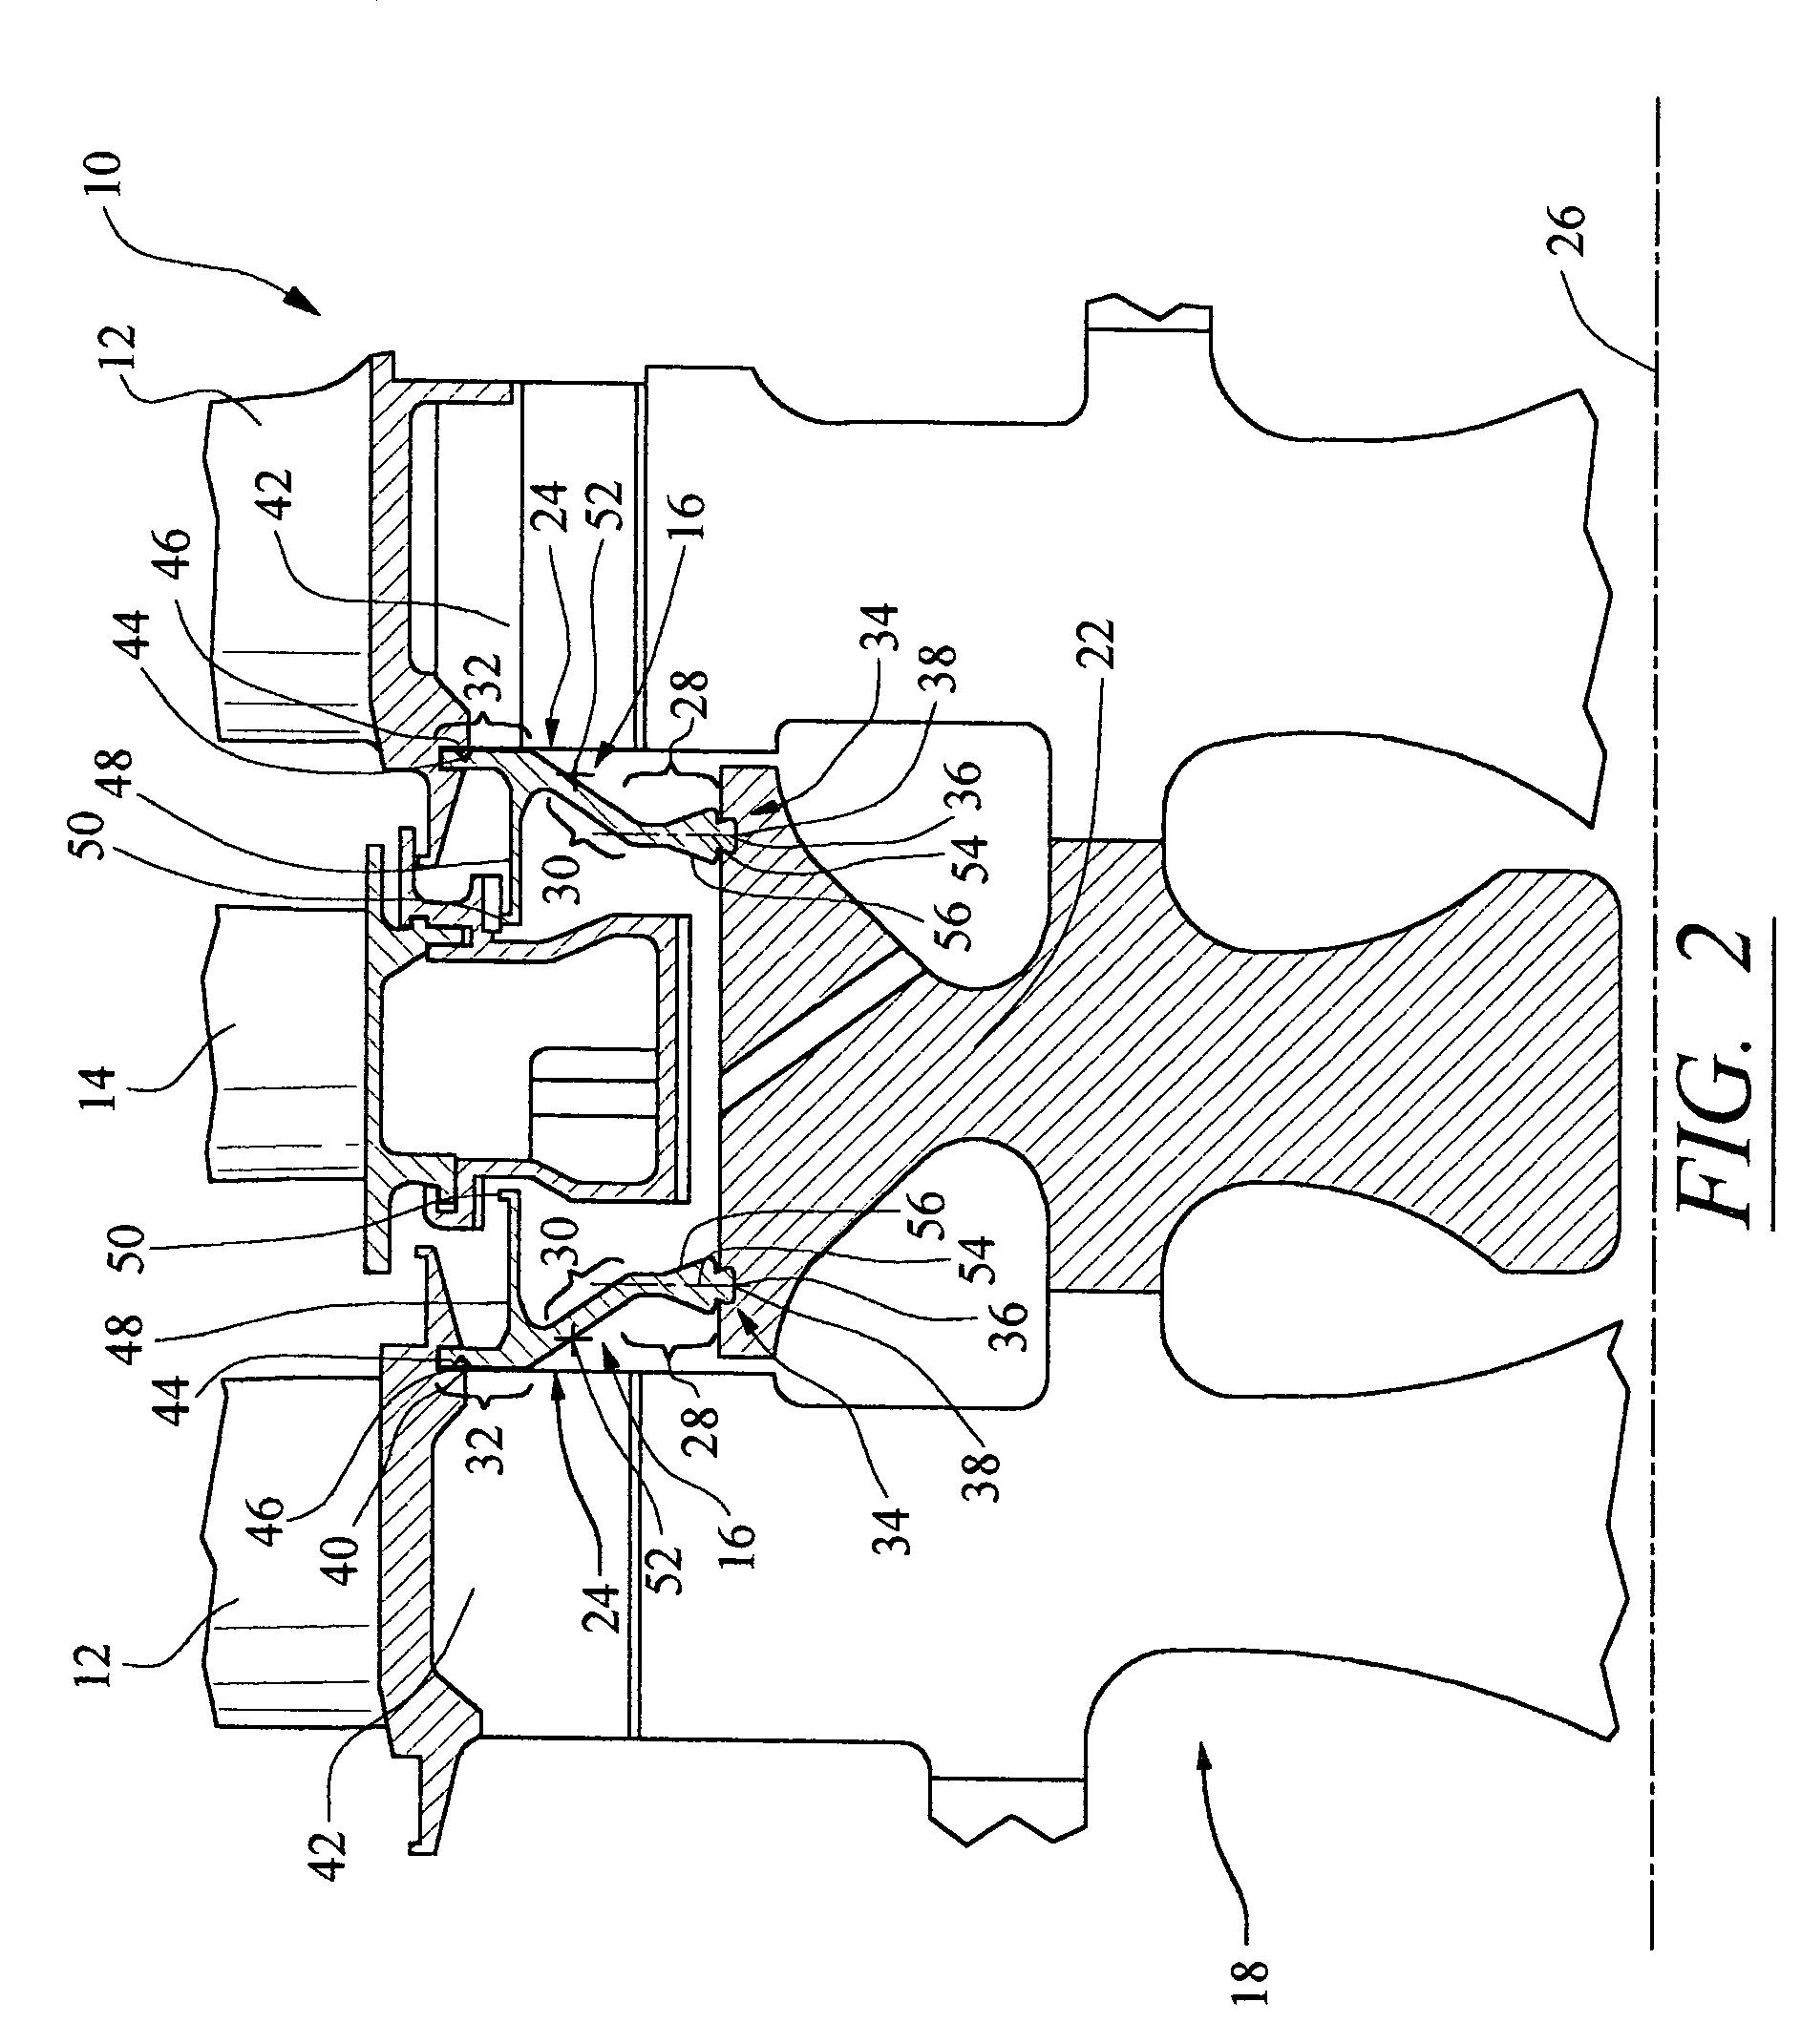 Diagram] 2002 Ford Taurus Spark Plug Wire Diagram Full